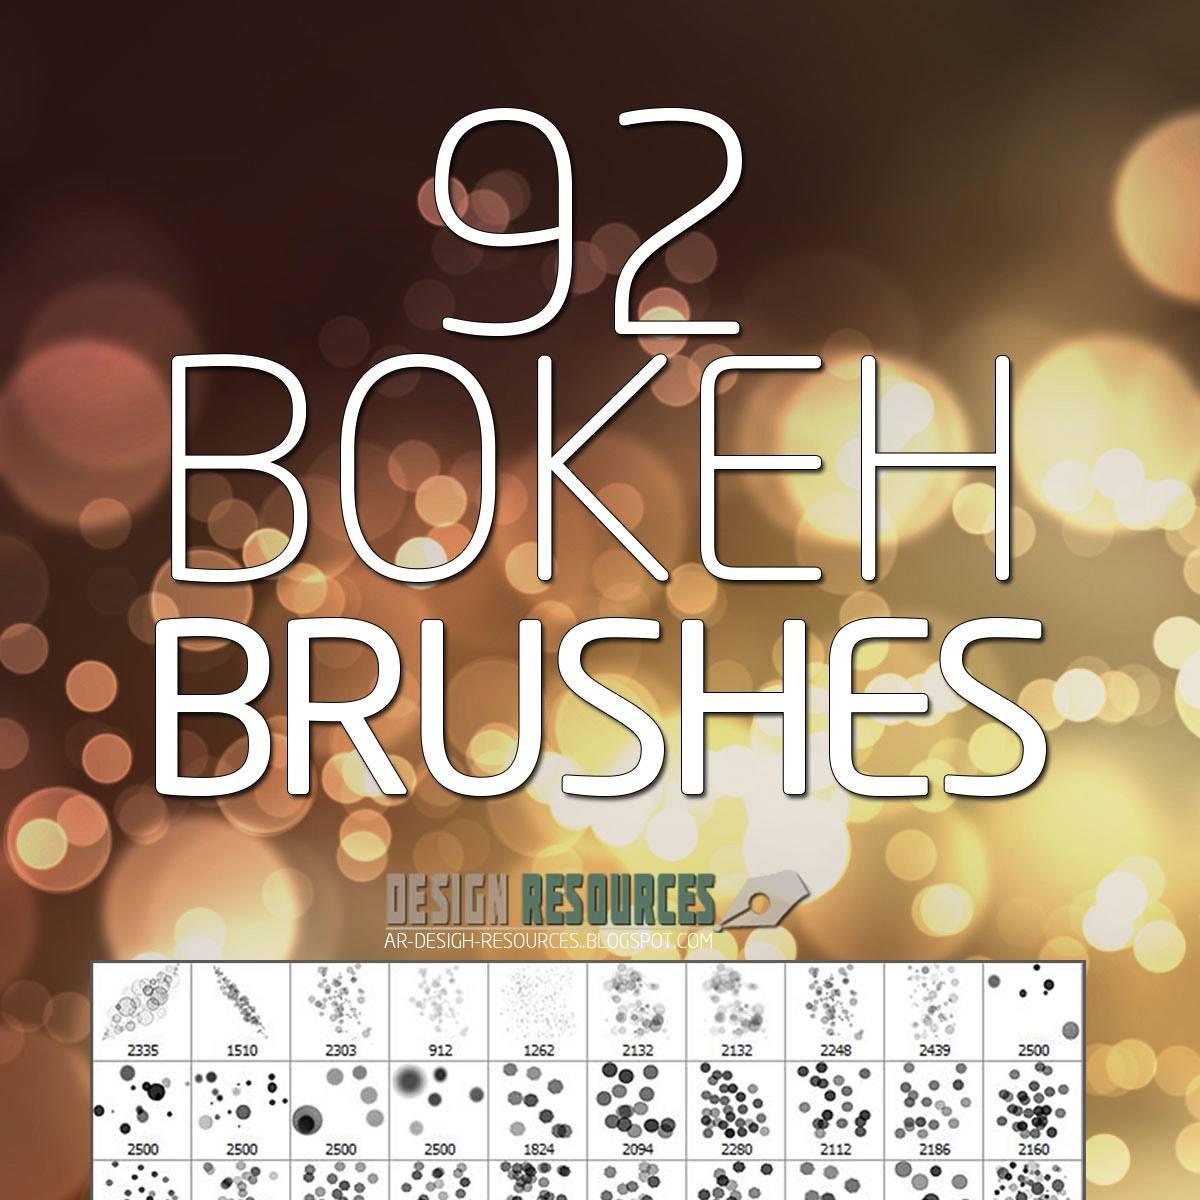 Bokeh PS Brushes Free Pack Photoshop brush